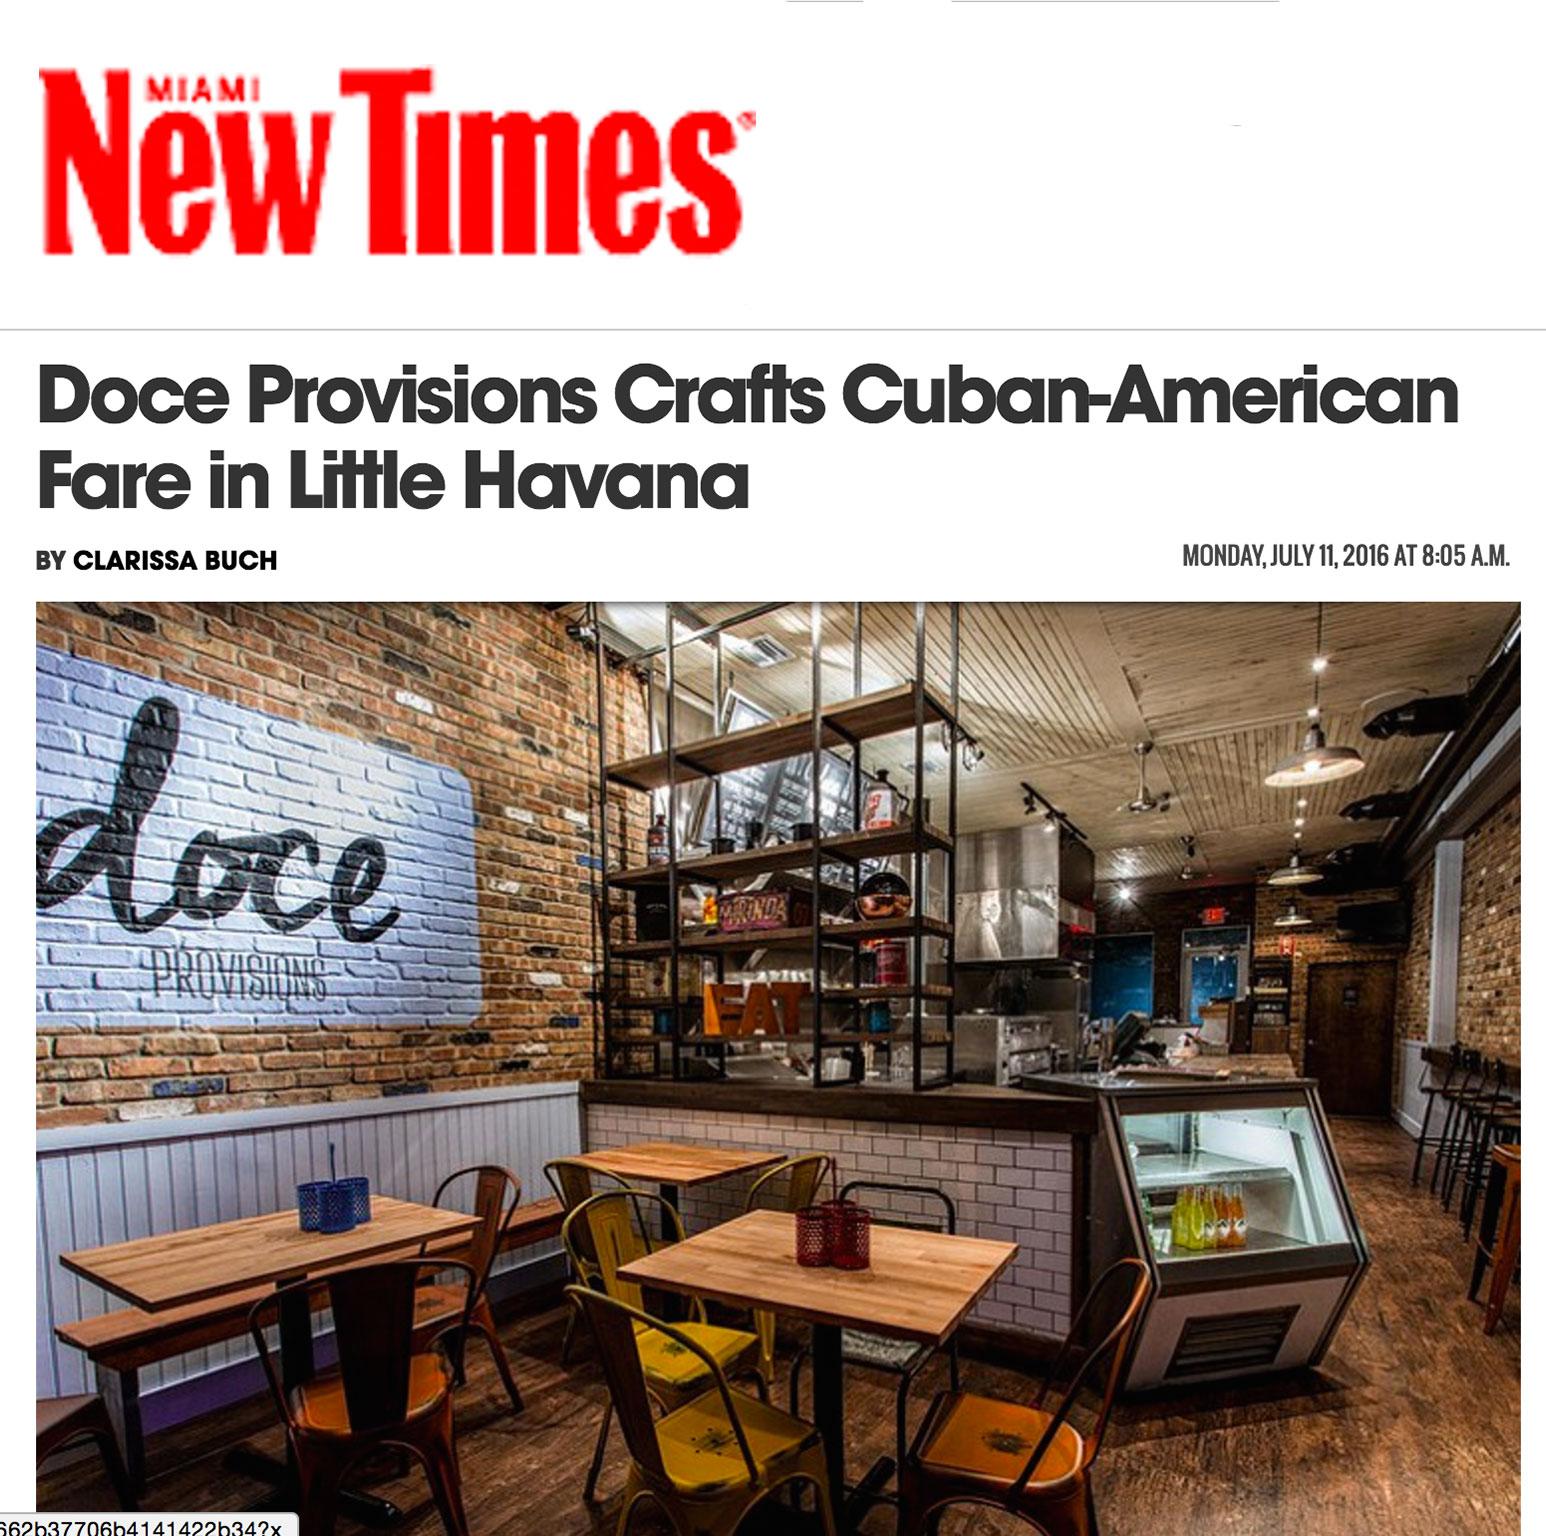 Doce Provisions crafts Cuban-American Fare in Little Havana ... READ MORE